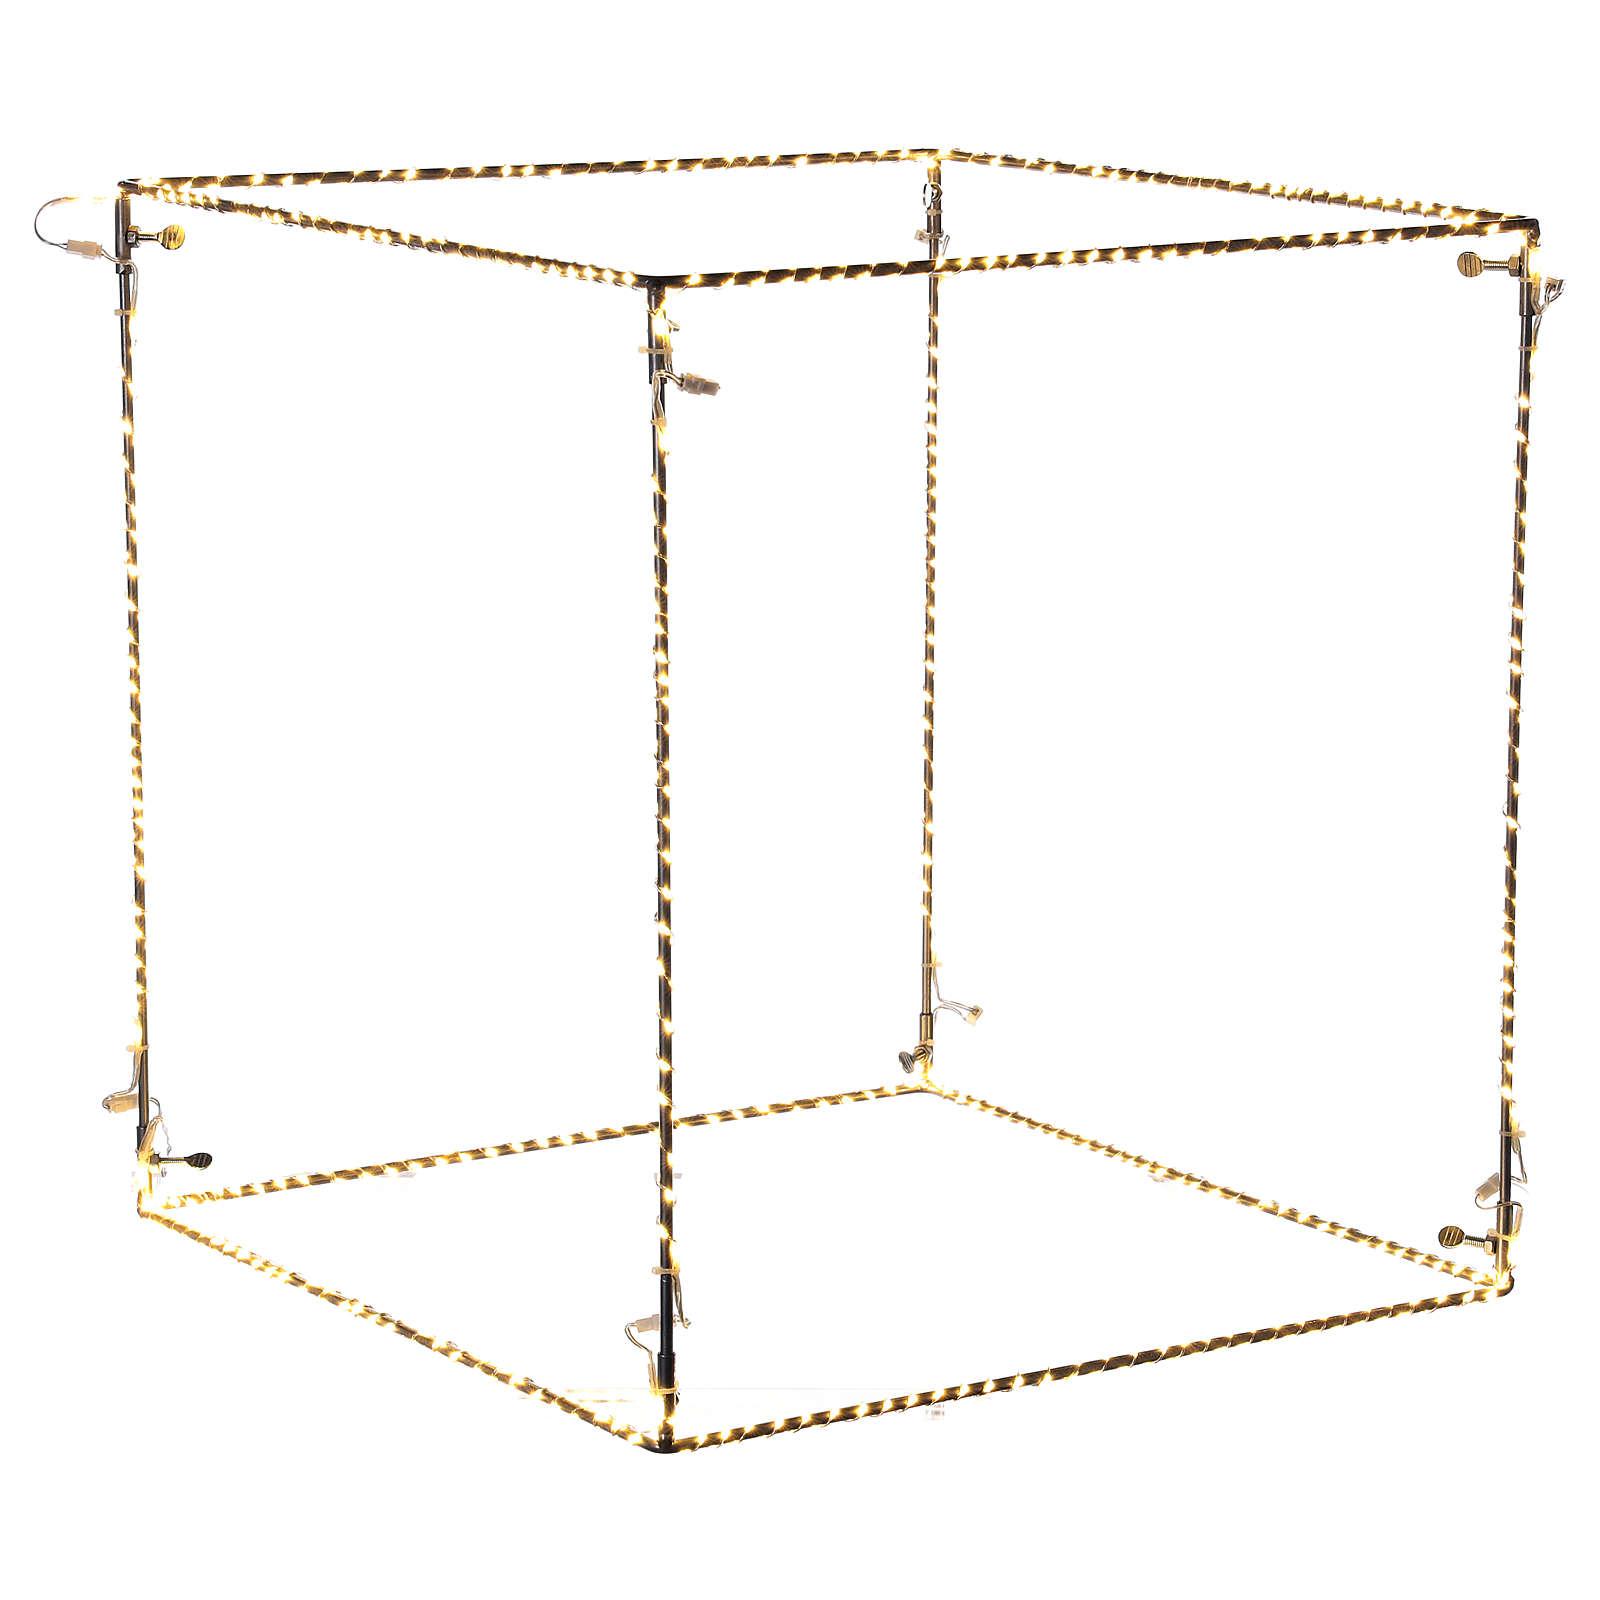 Christmas light cube 50 cm, 740 LED lights, warm white, indoor use 3